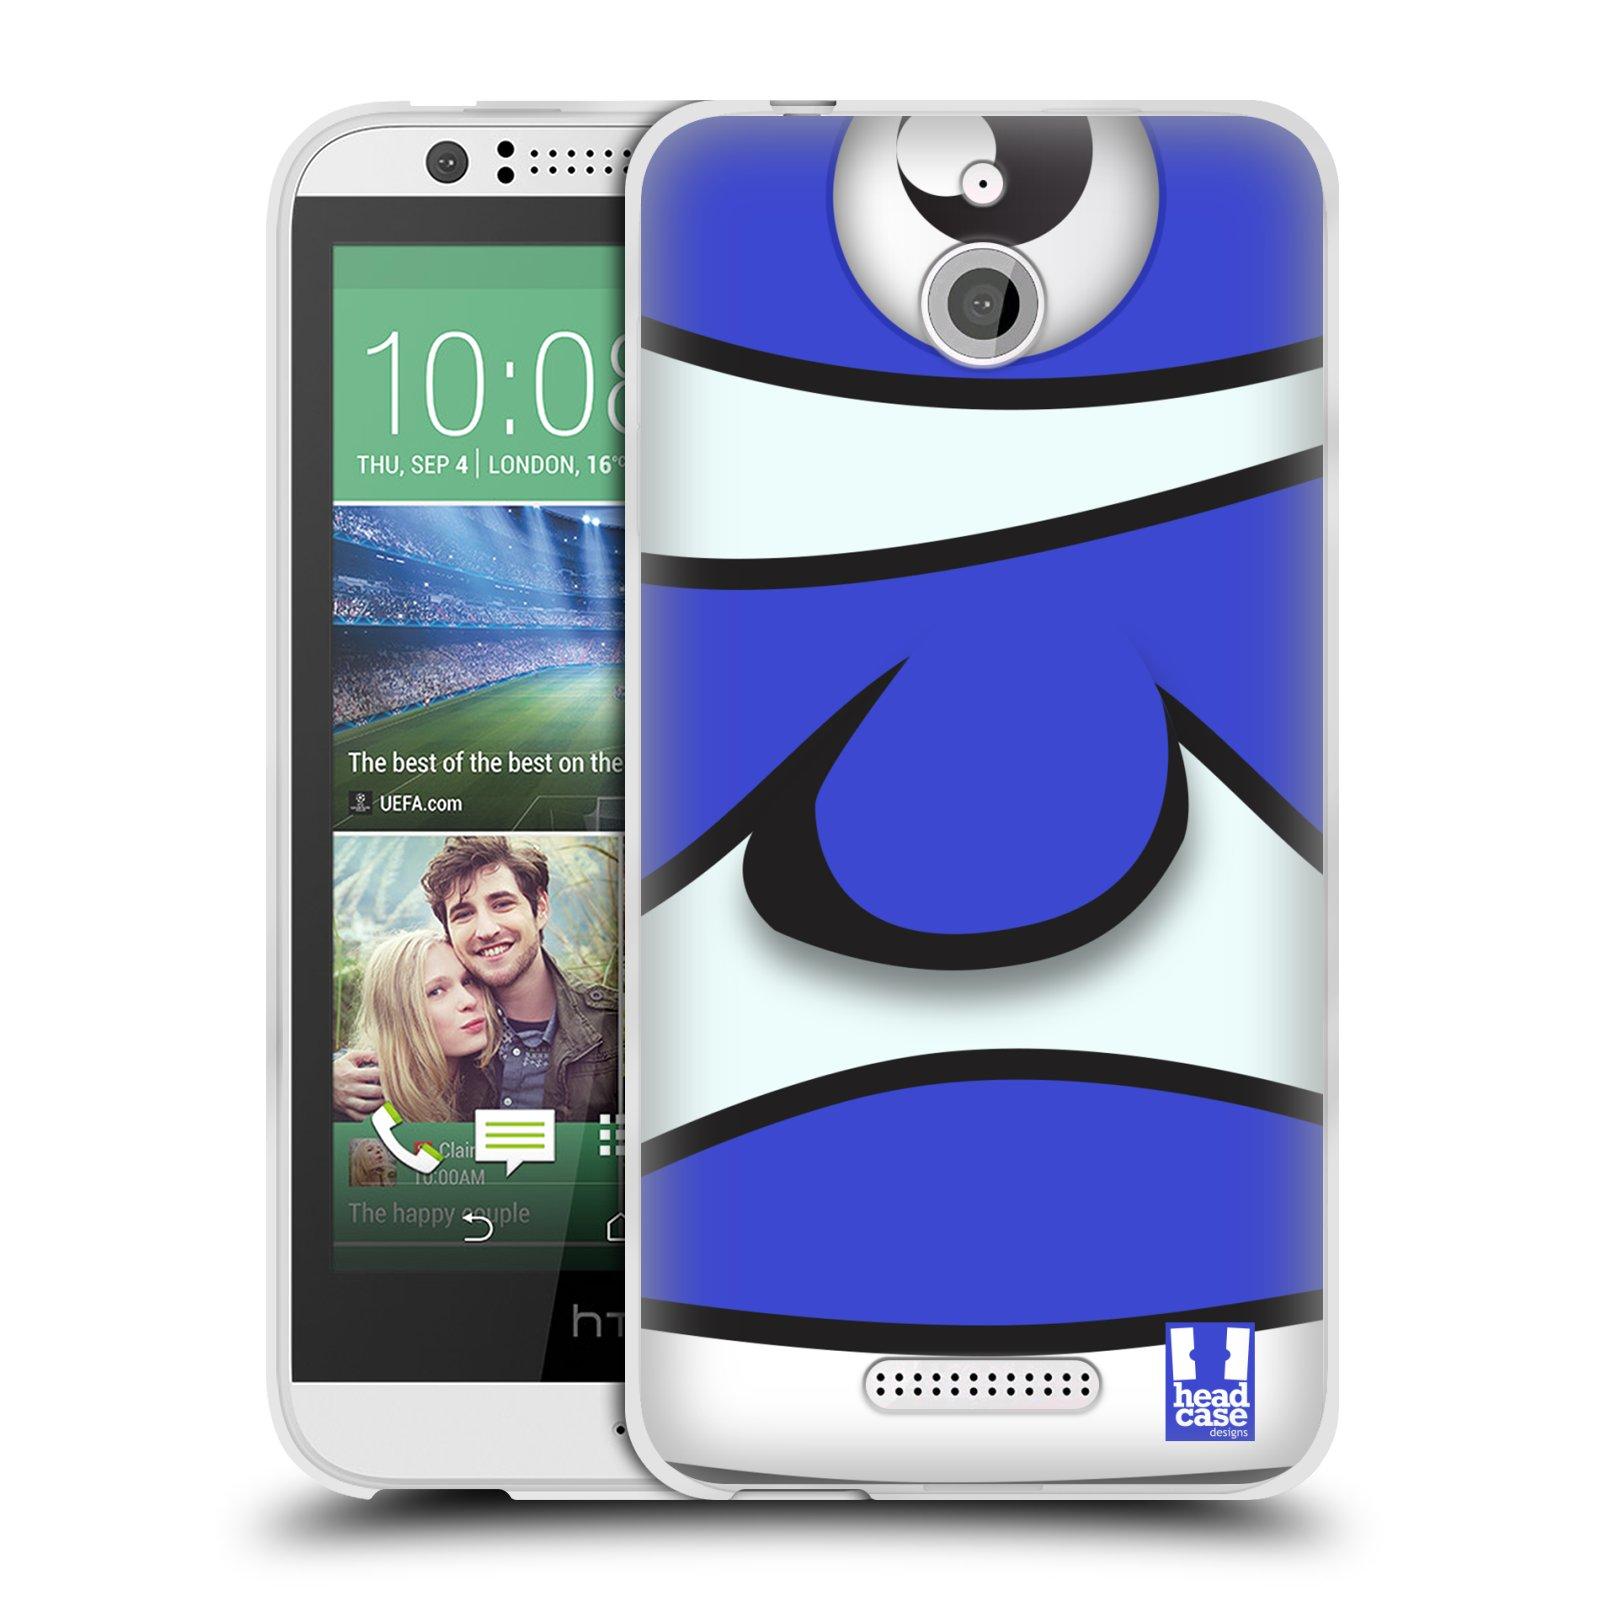 HEAD CASE silikonový obal HTC DESIRE 510 vzor Rybičky z profilu modrý klaun